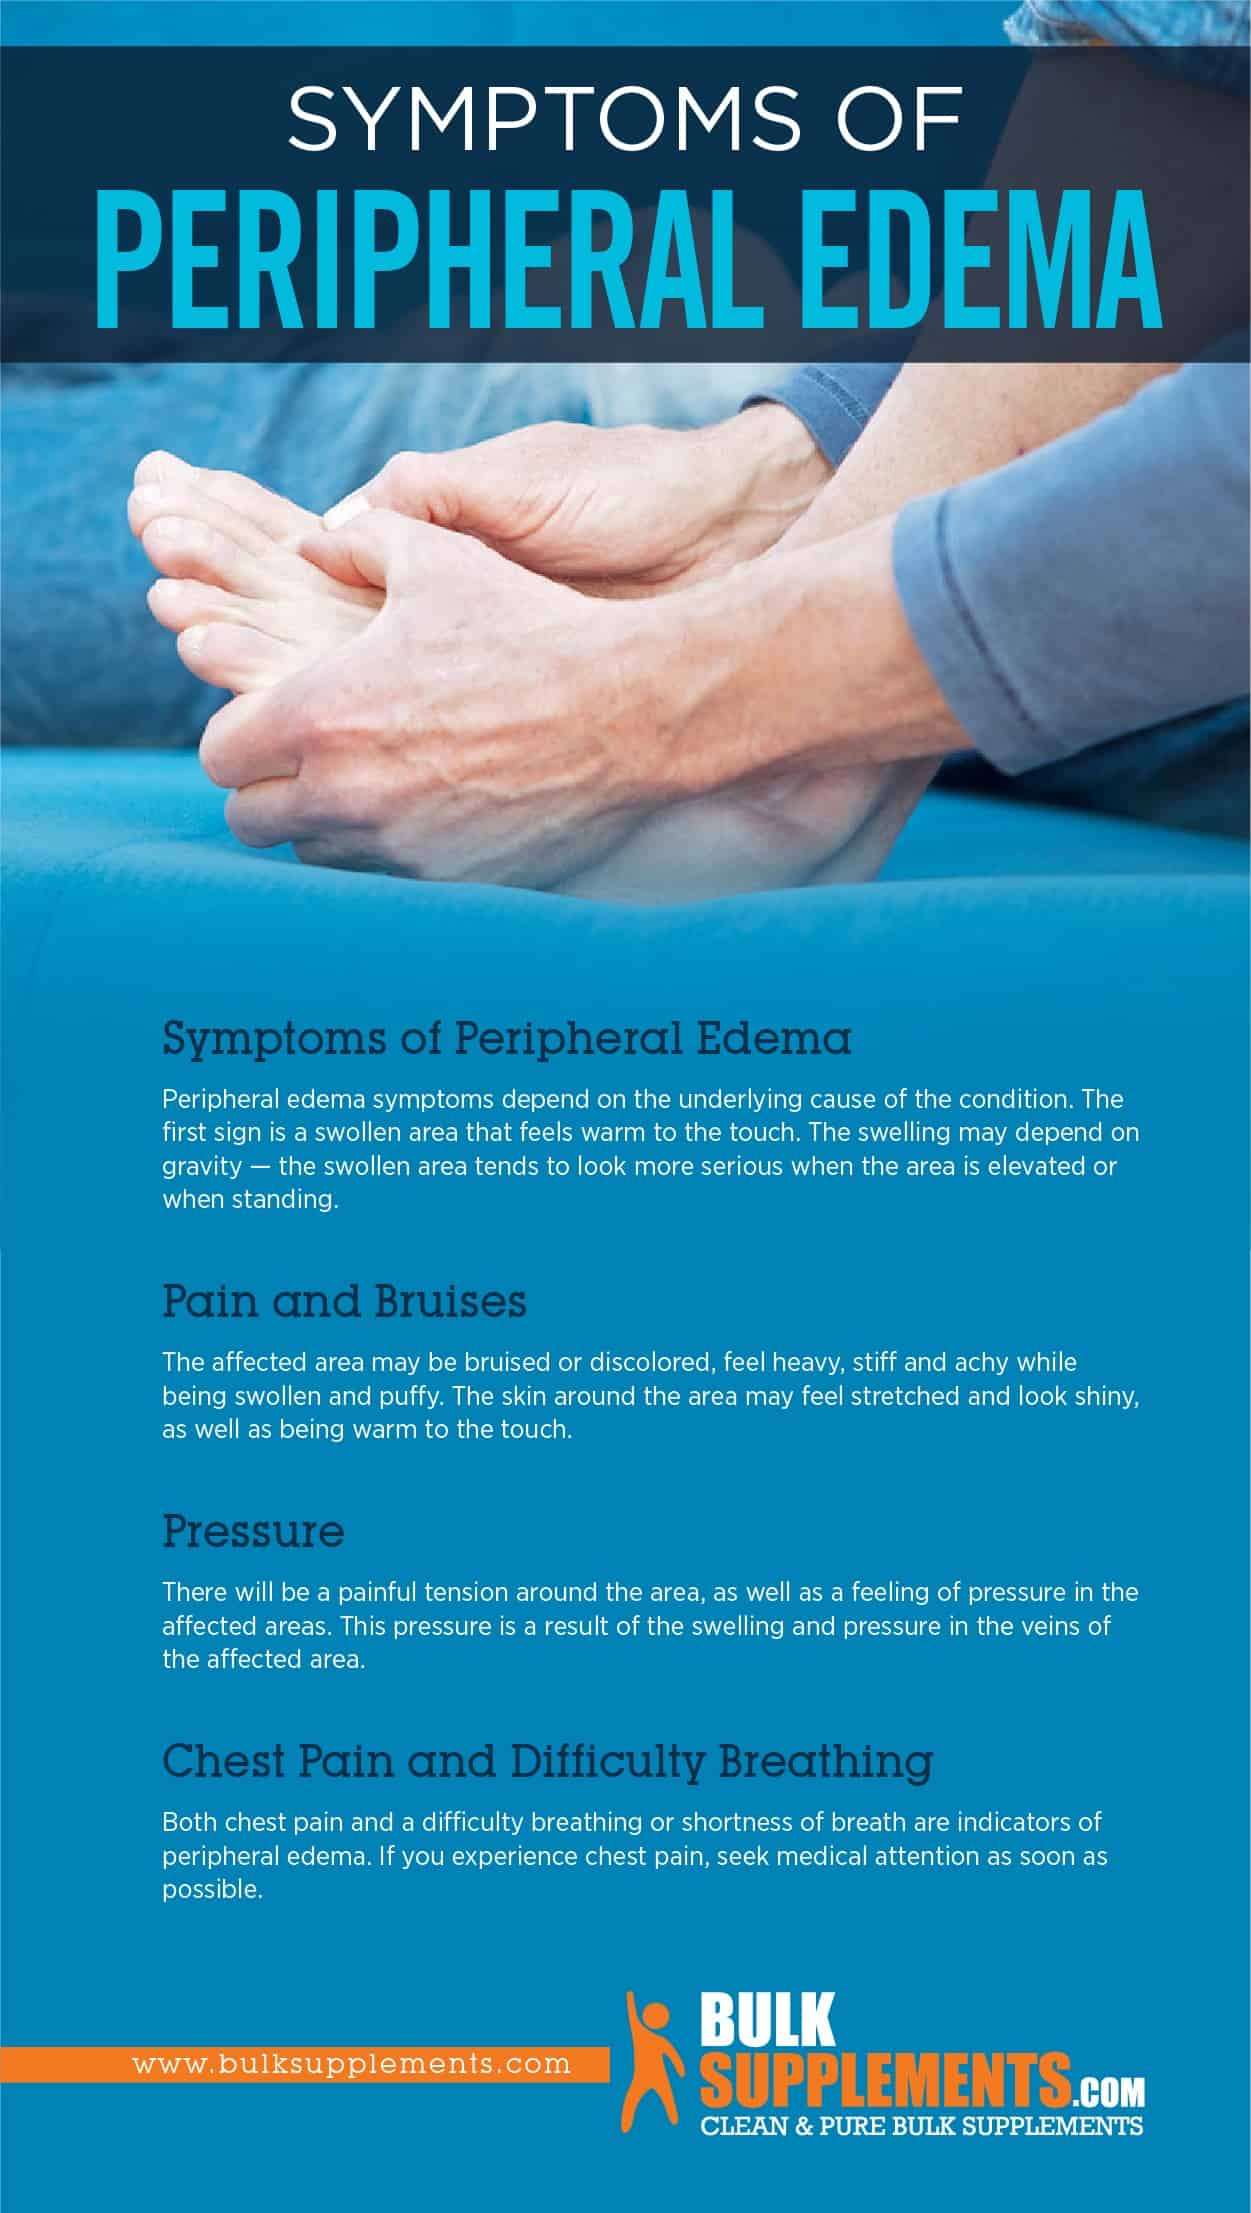 Symptoms of Peripheral Edema